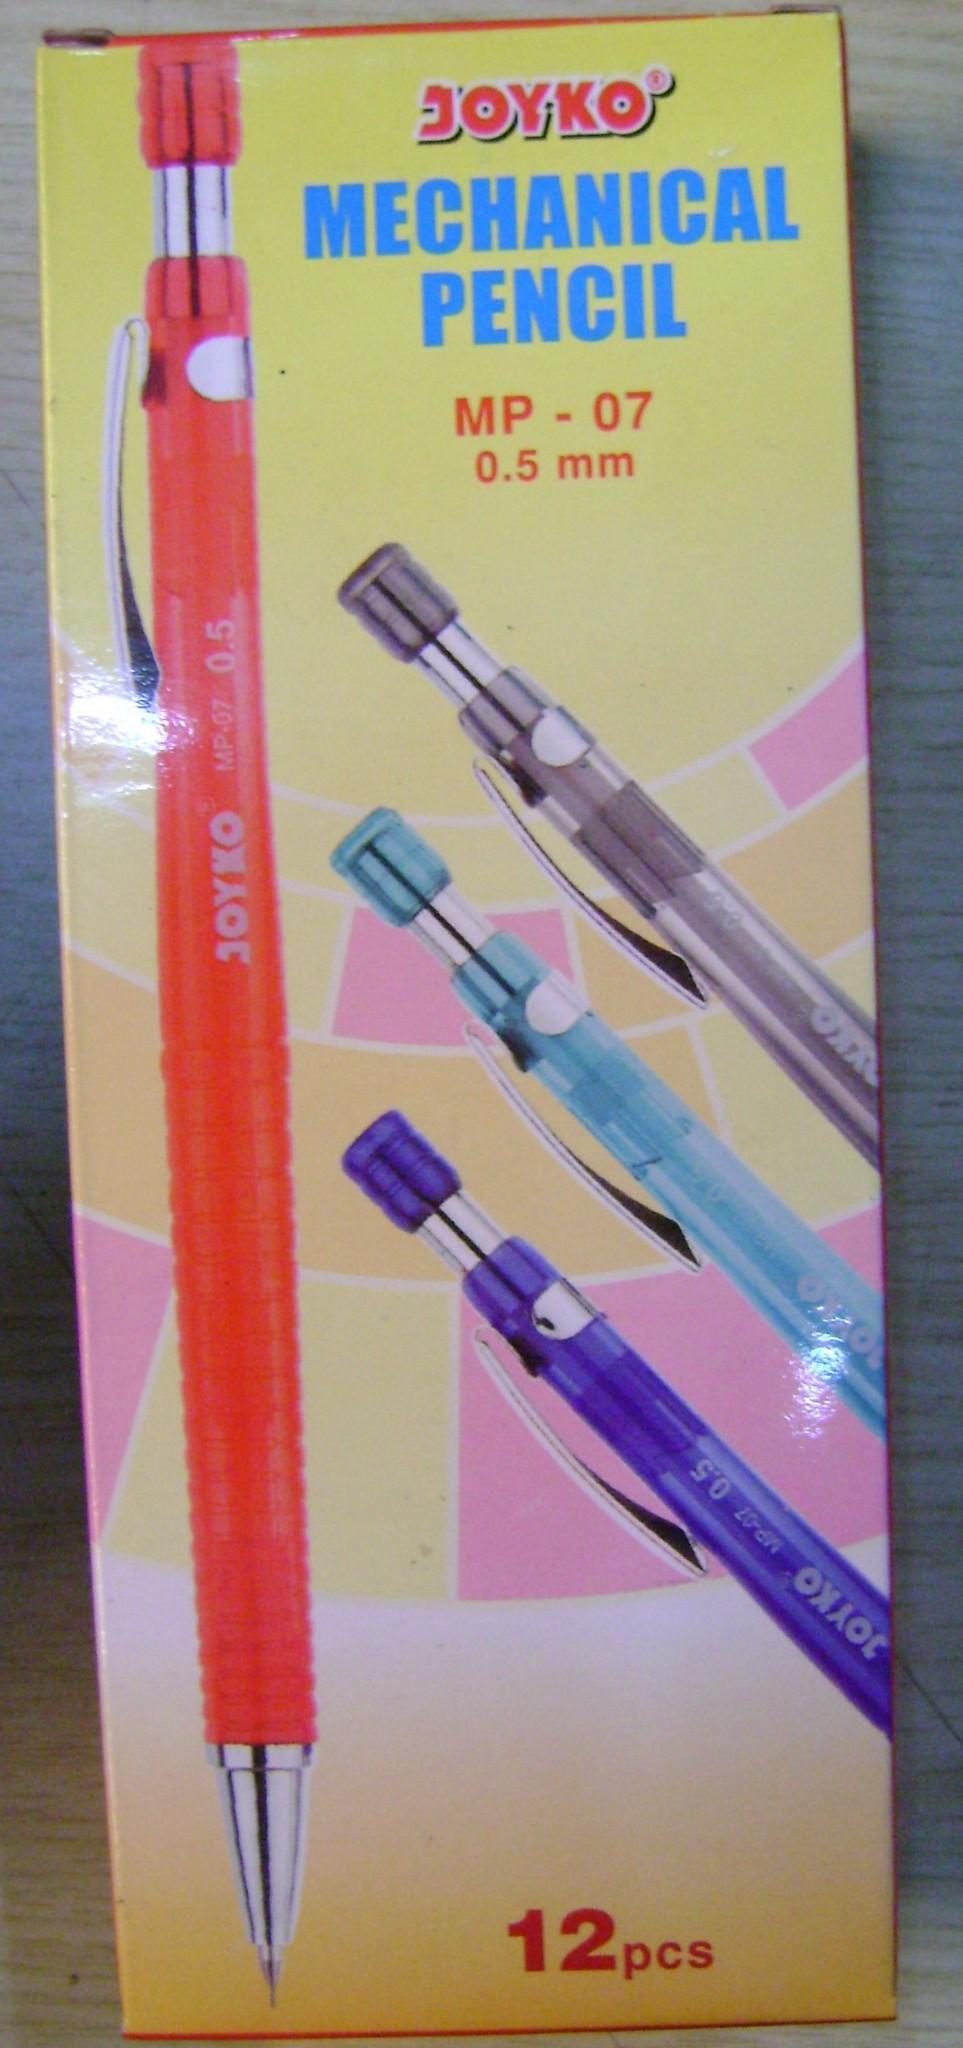 Mechanical Pencil - Joyko - MP-07 (0.5)